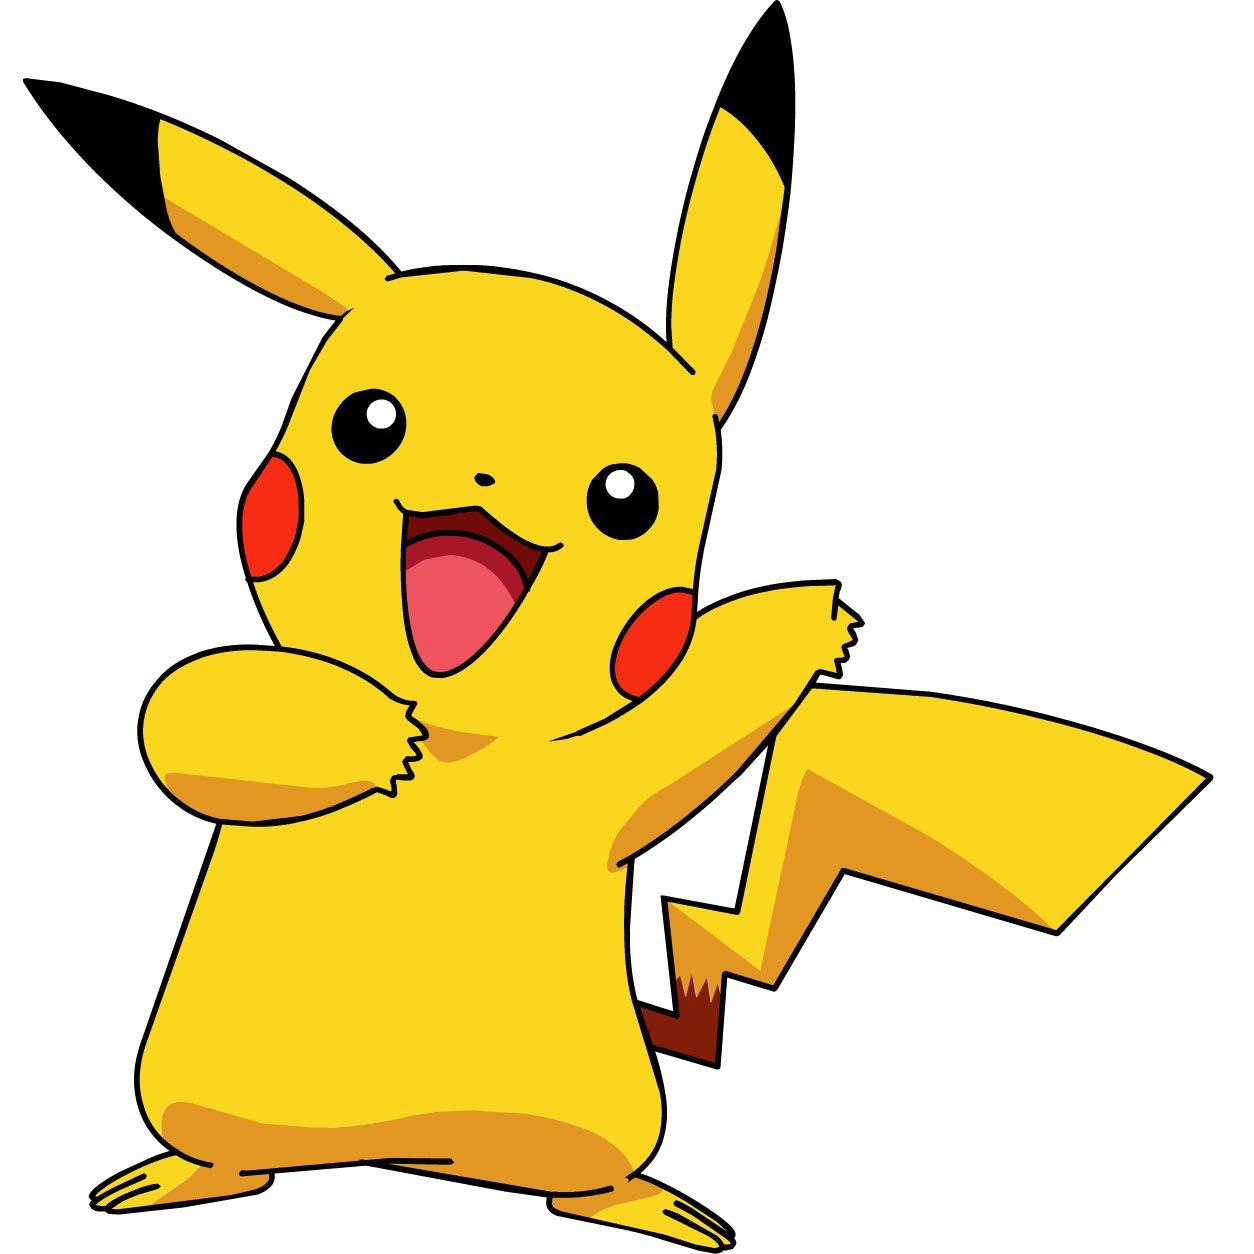 jogos de desenhar pokemons